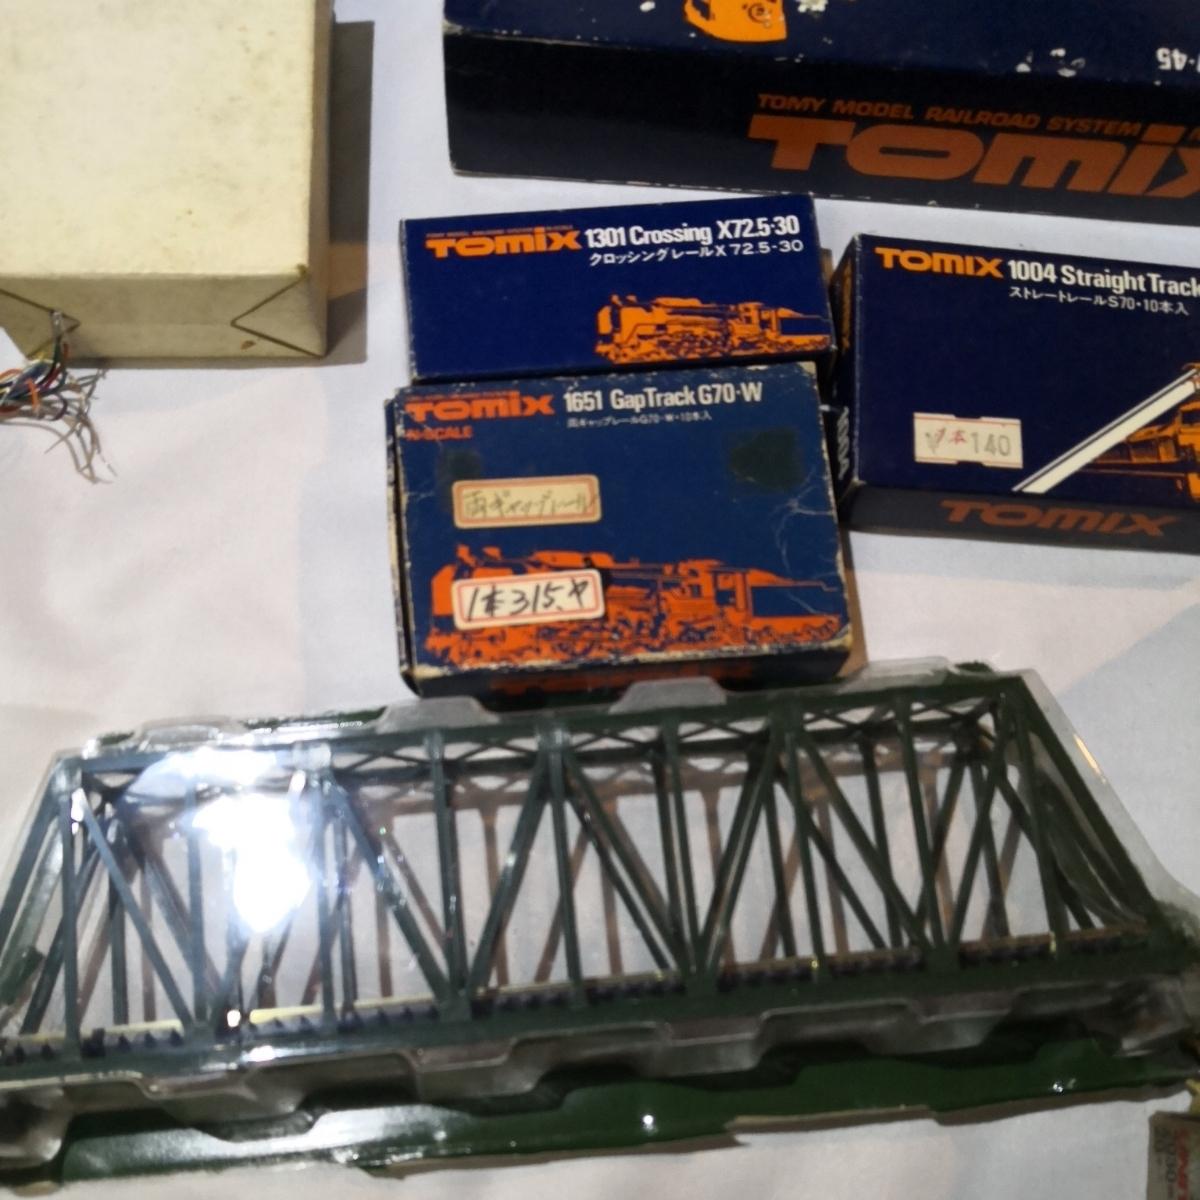 Nゲージ 鉄道模型用 レール ポイント切り替え部品 陸橋 など ジオラマ用部品 大量一括 TOMIX KATO _画像3